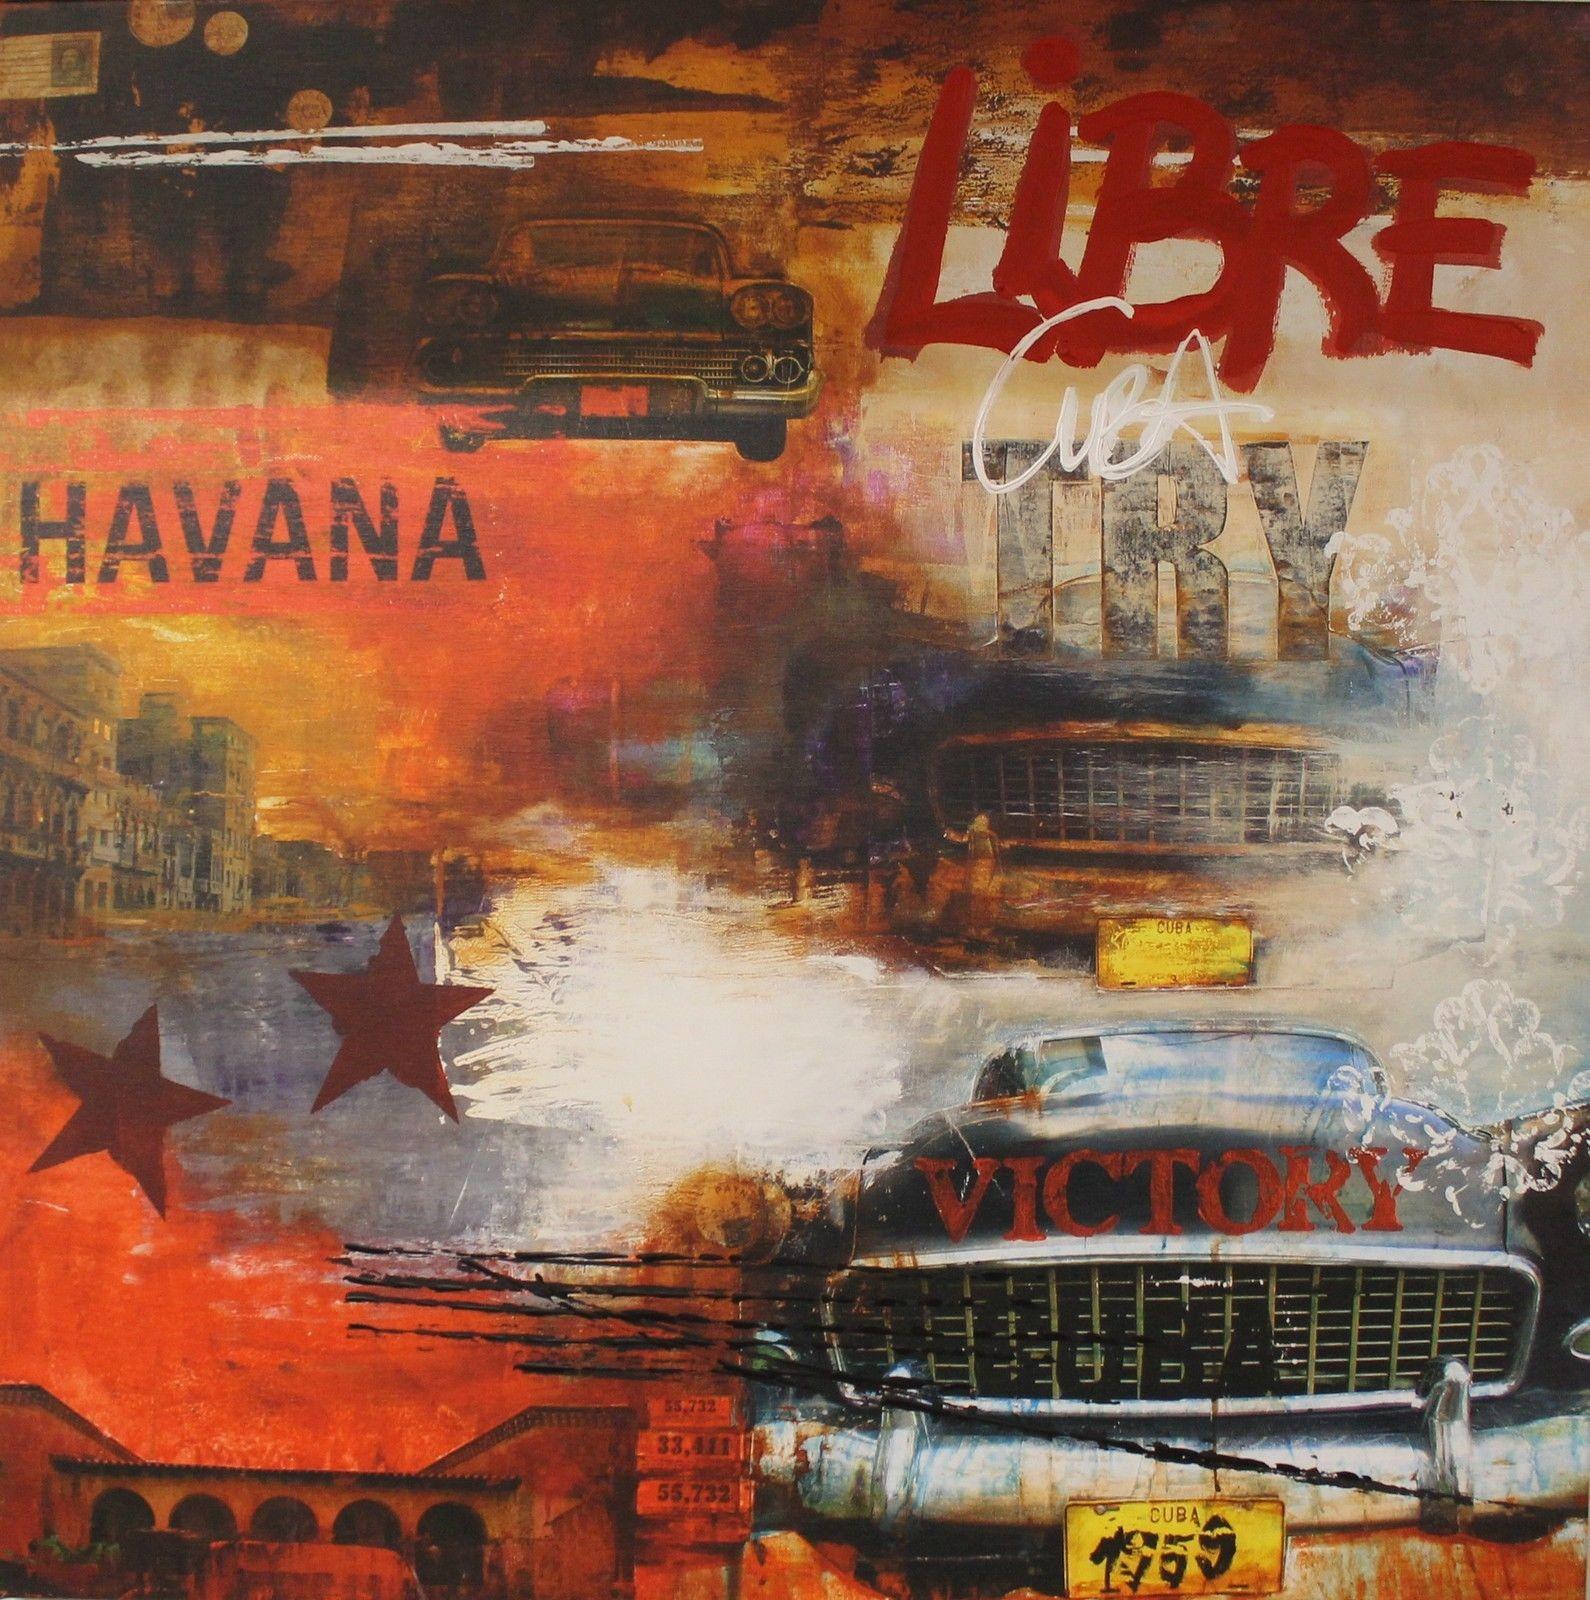 Kunstdruck & Original Malerei Havanna Cuba Libre